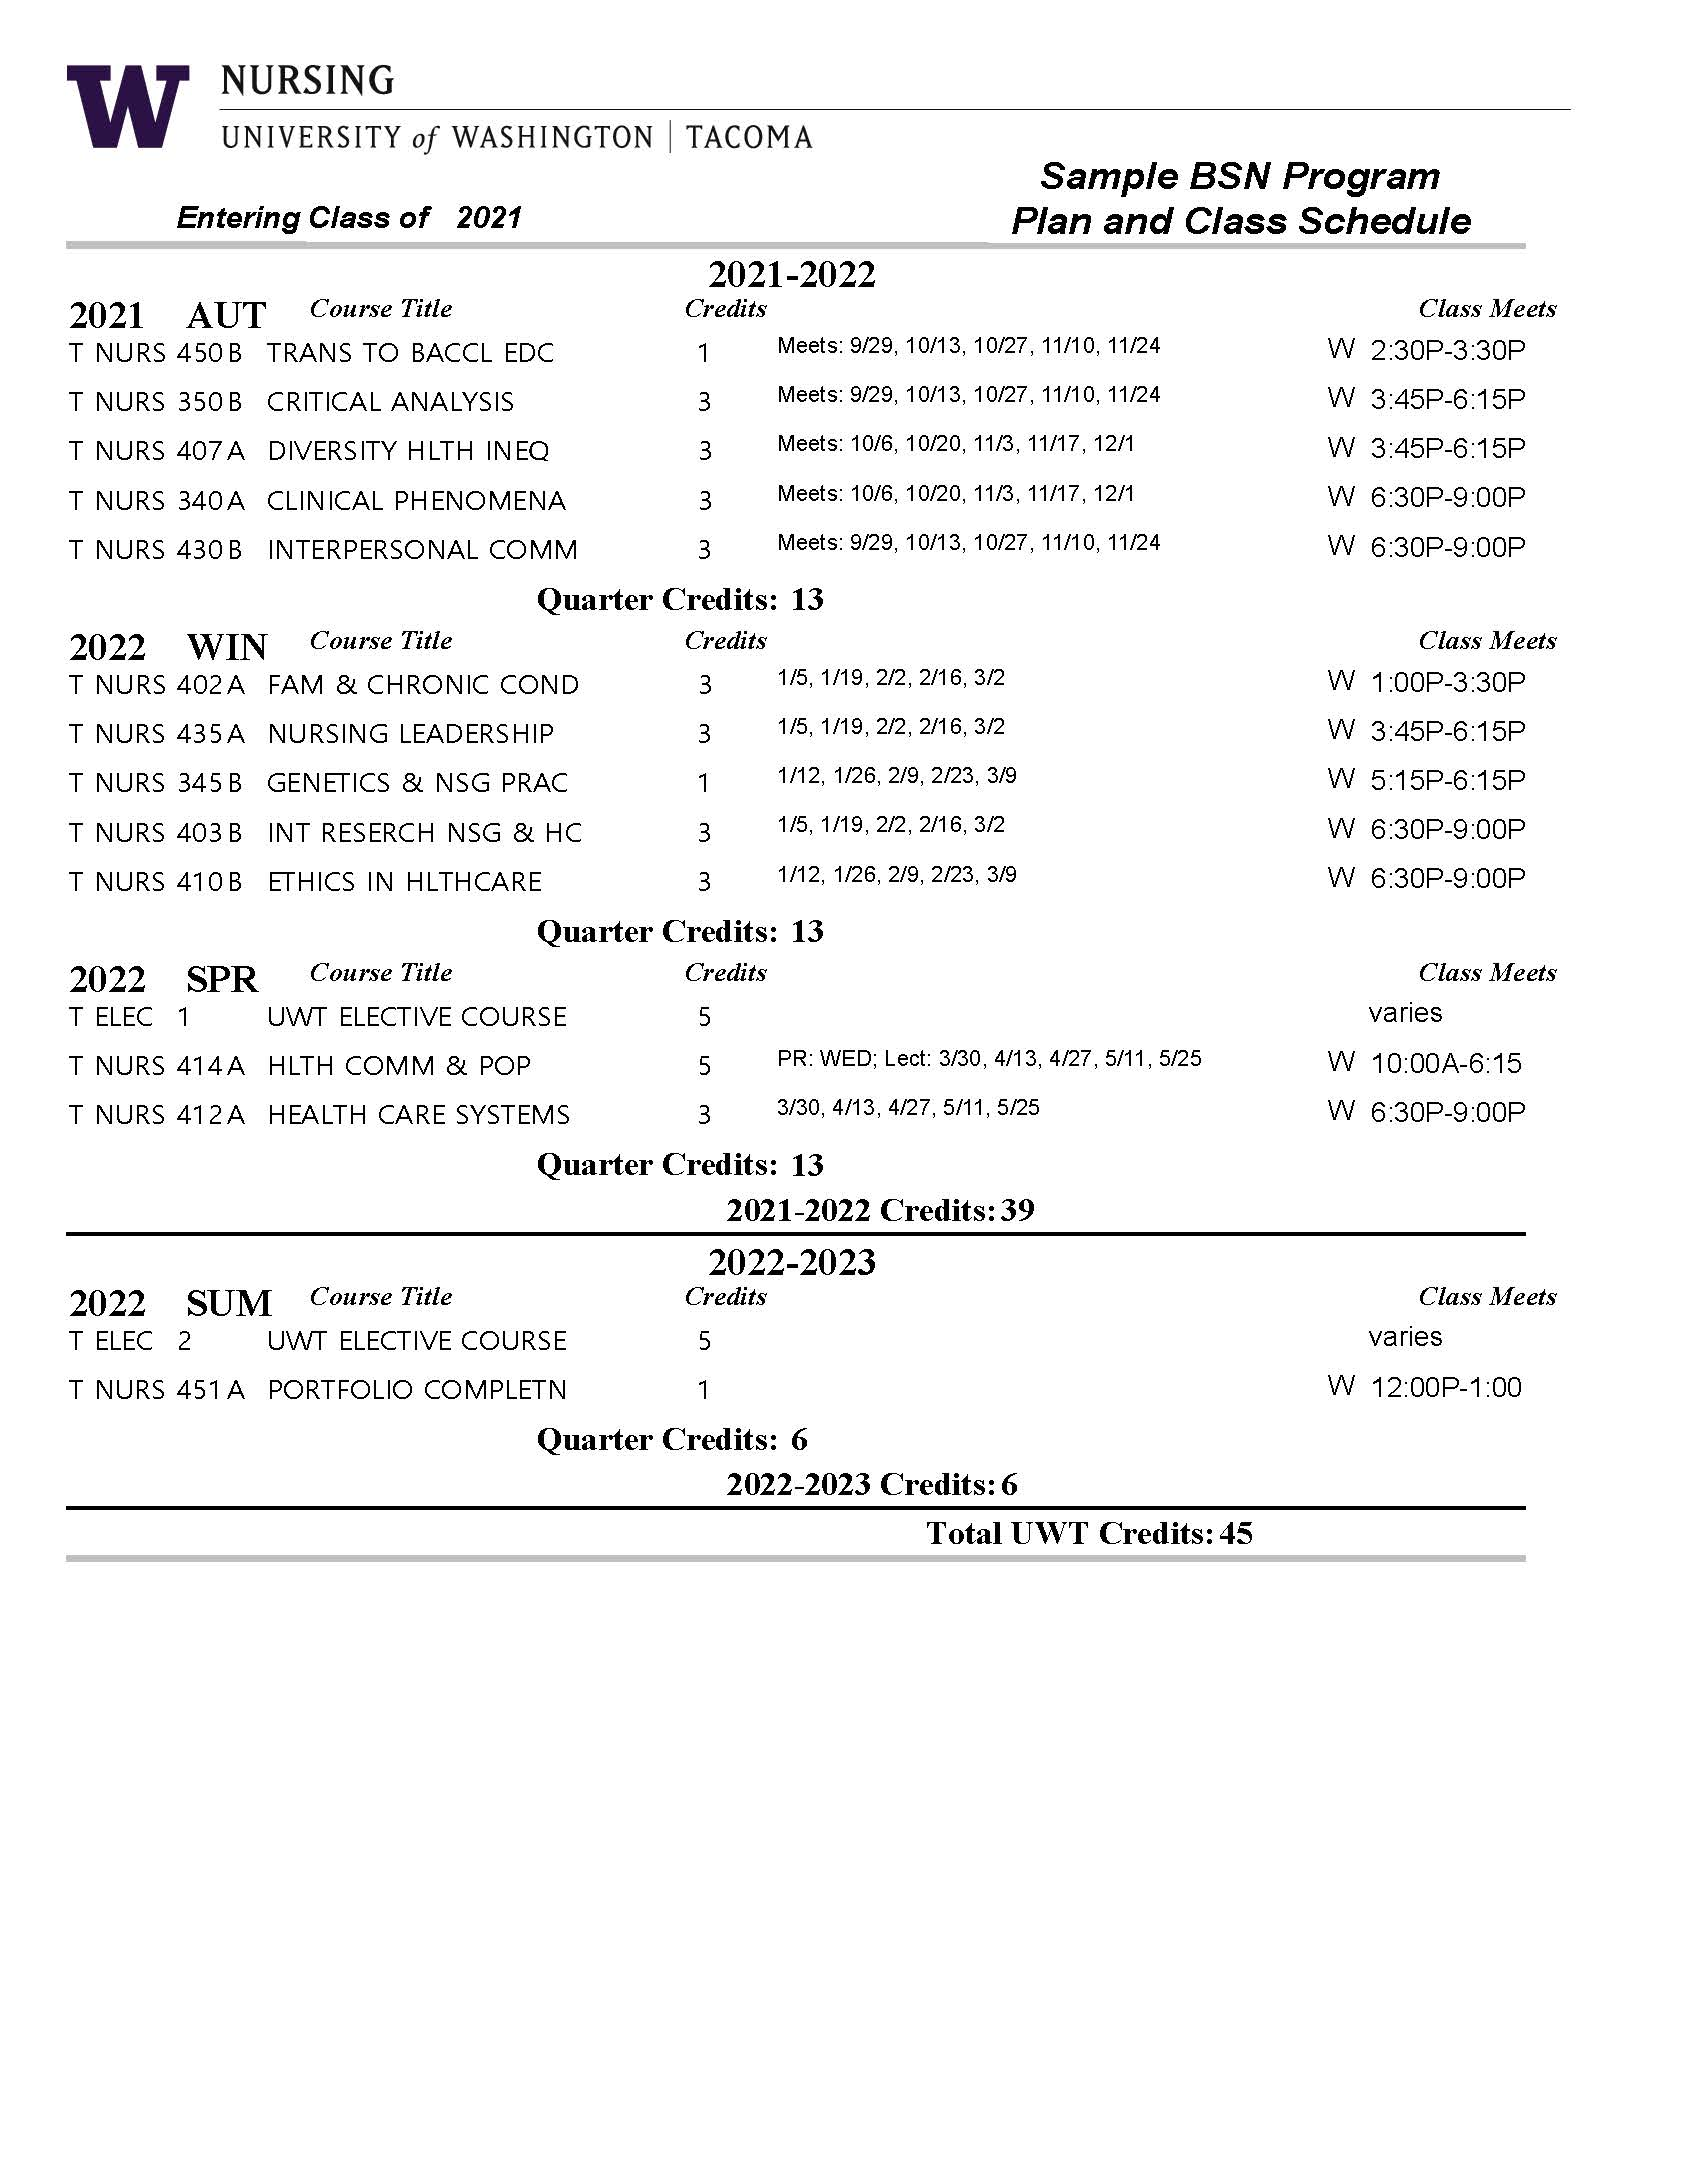 Sample BSN program plan AUT 21 FT